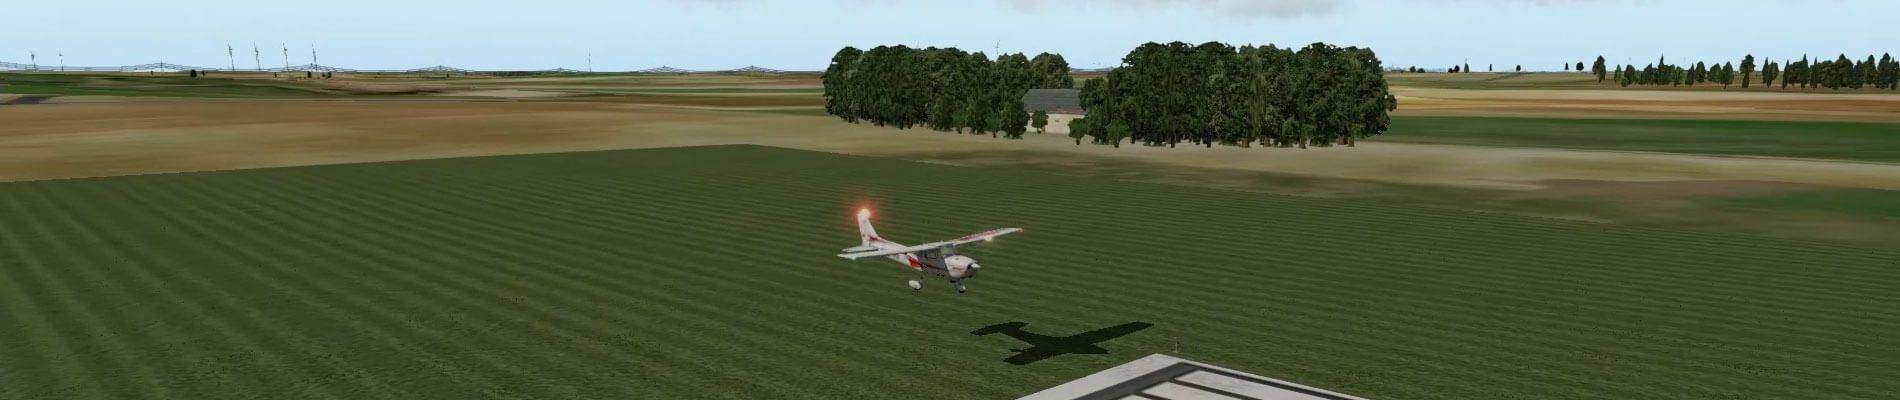 Min blog om X-Plane